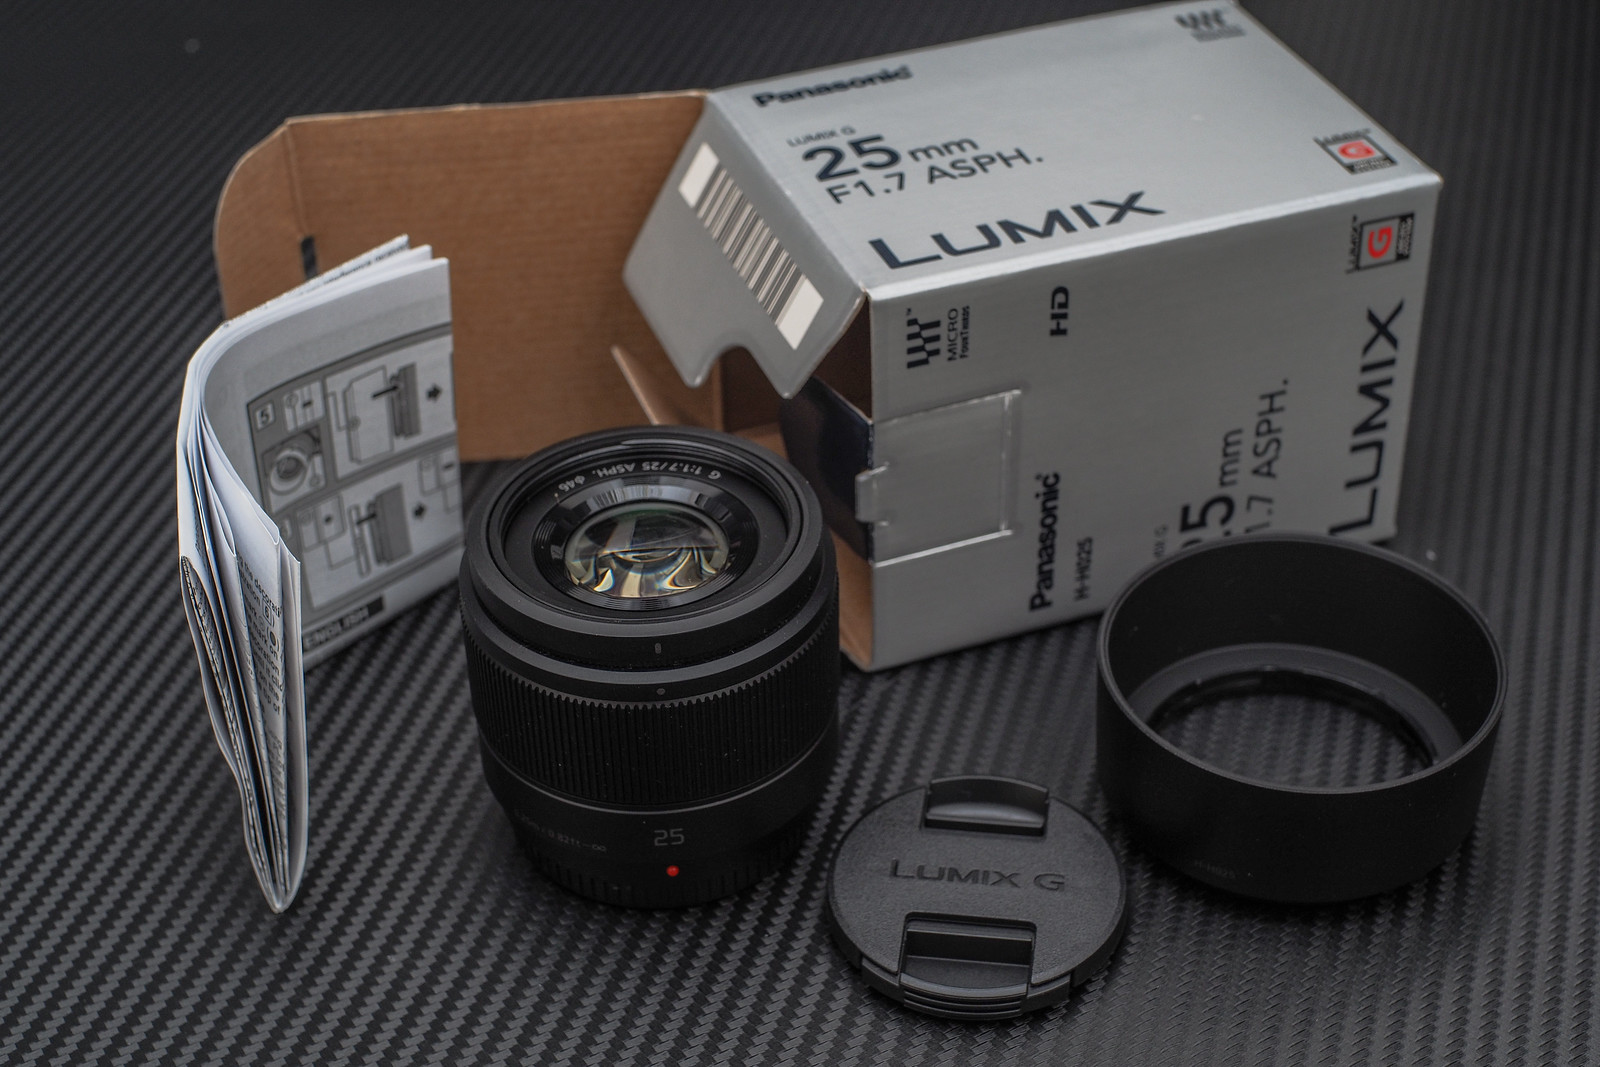 Panasonic Lumix G 25mm F 17 Flickr F17 Asph Lens